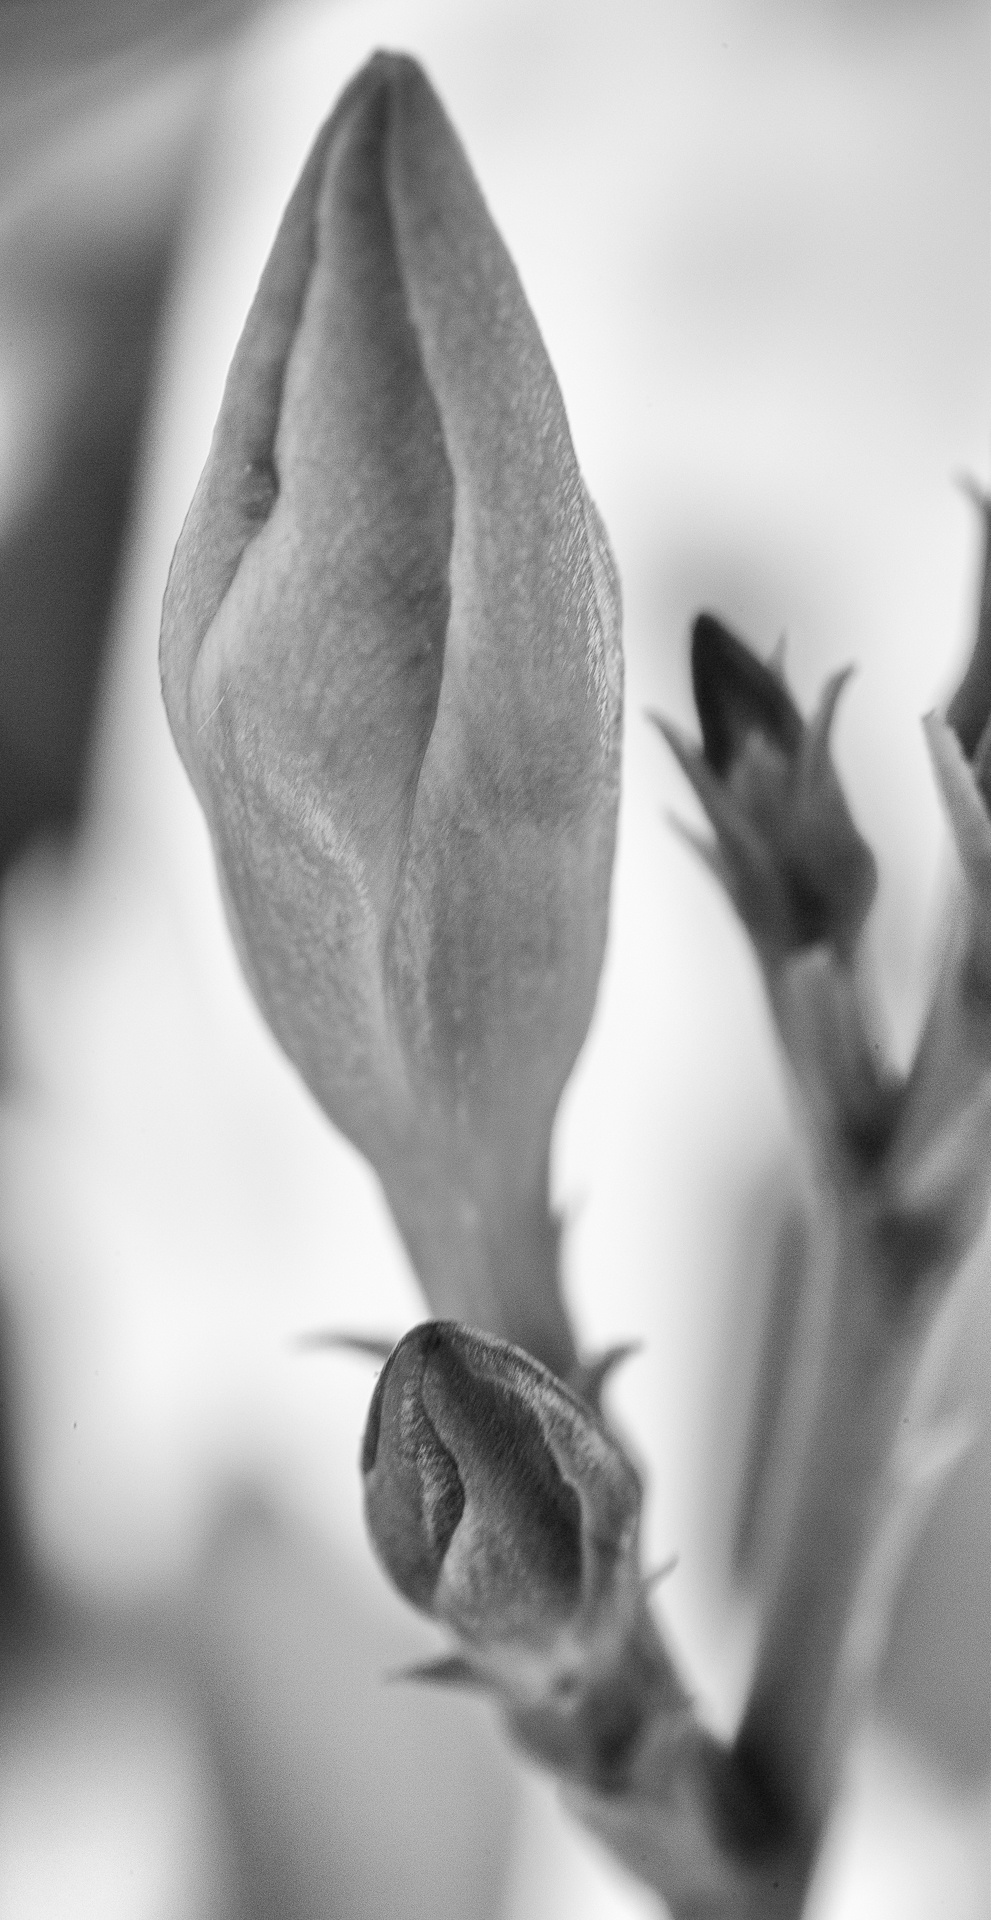 Bud of the iris flower